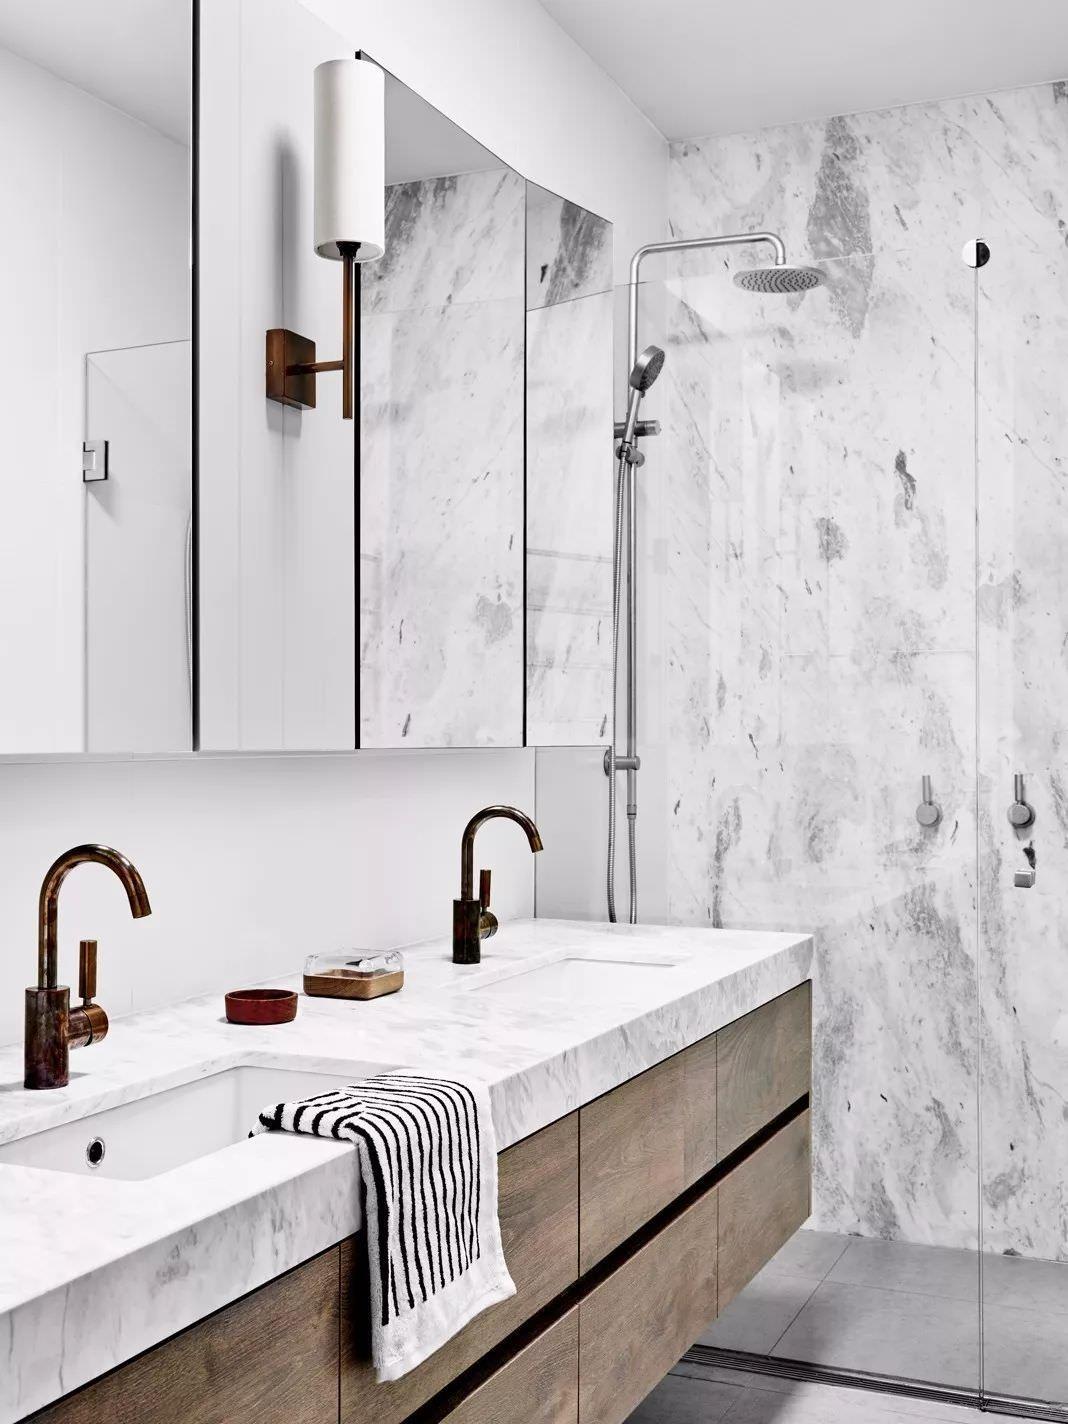 2018 Design Trends For The Bathroom Minimalist Bathroom